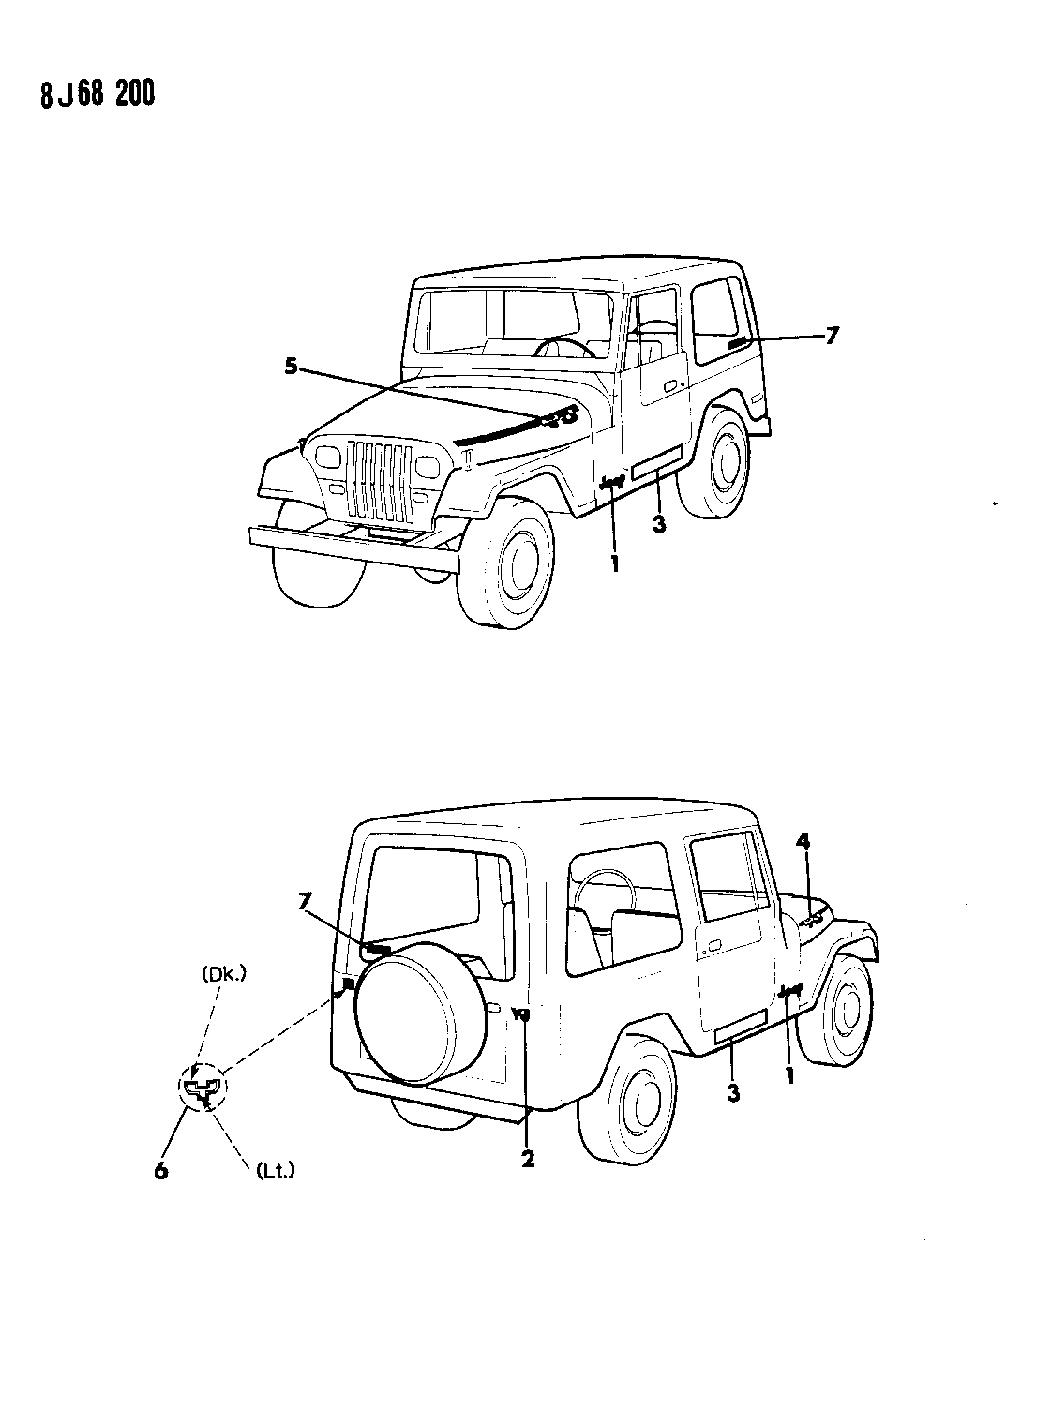 1988 Jeep Wrangler Decals Exterior Mopar Parts Giant Addition Yj Sahara On 90 Hose Diagram Thumbnail 1